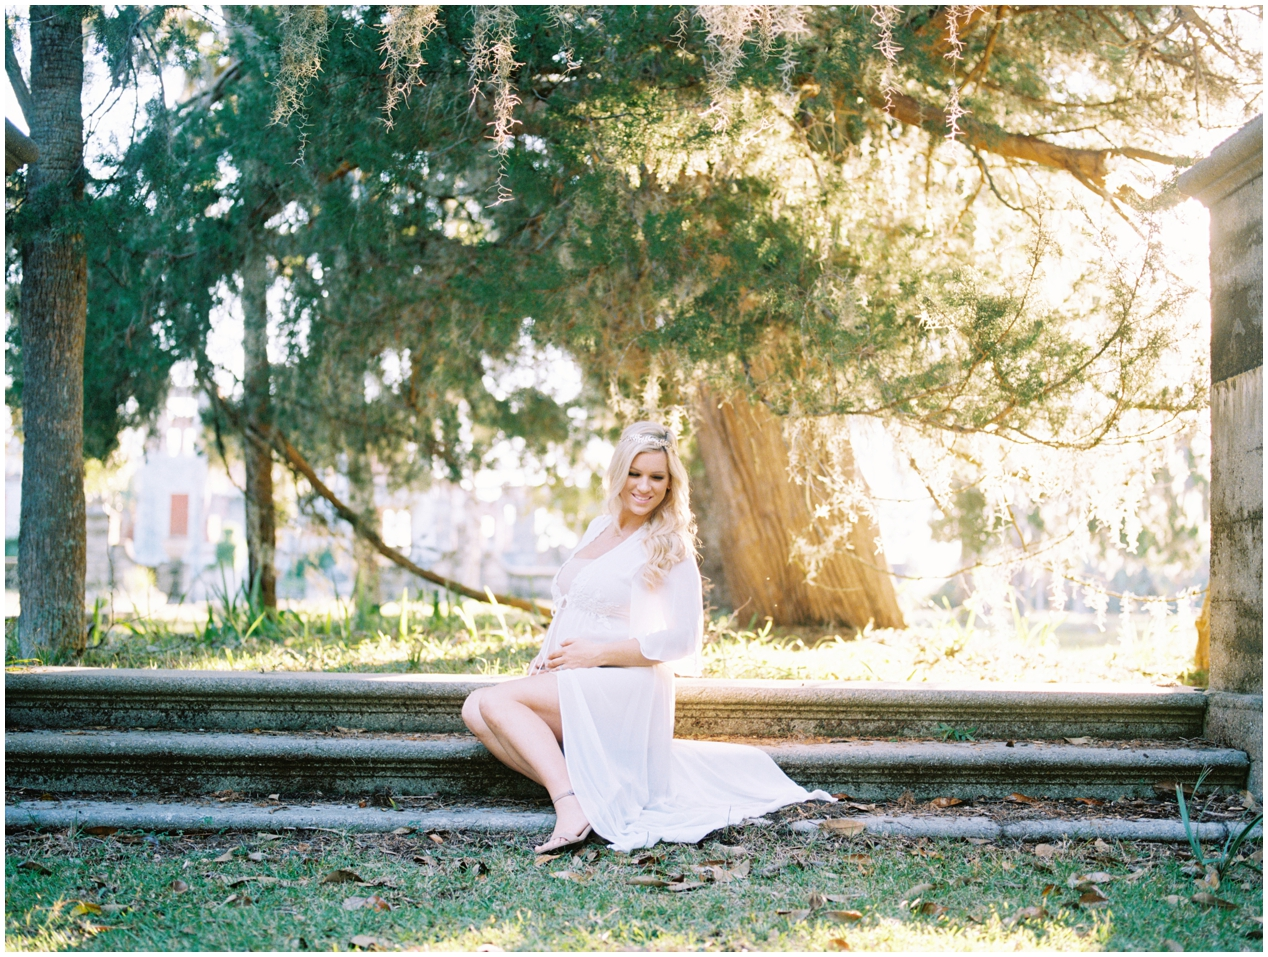 Lisa Silva Photography -Maternity Session at Cumberland Island, Georgia - Jacksonville and North East Florida Fine Art Film Photographer_0015.jpg